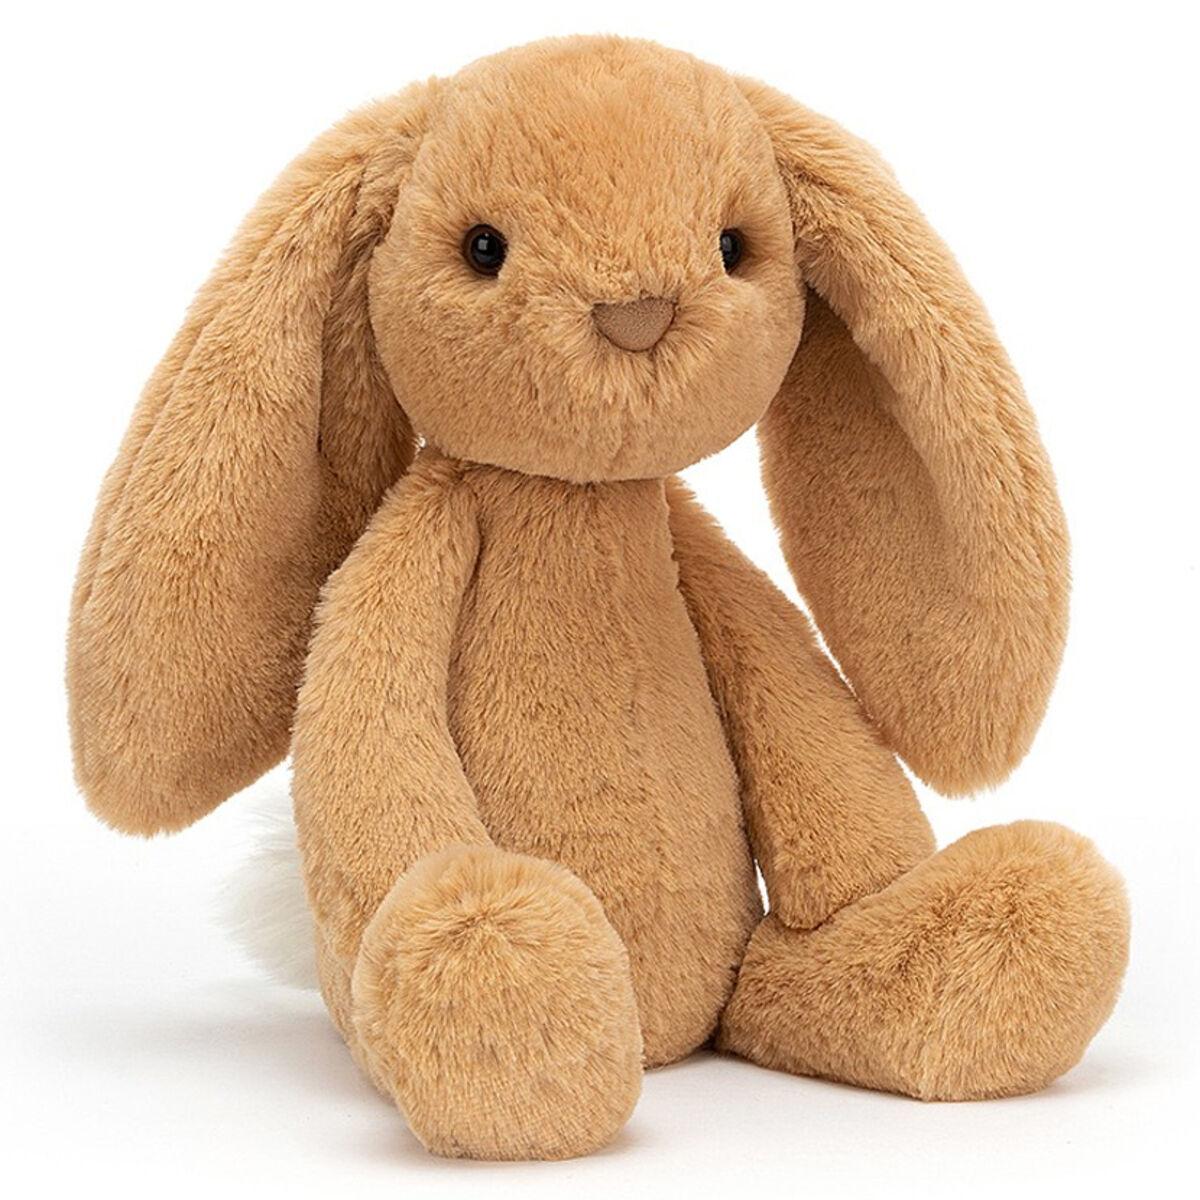 Jellycat Wumper Rabbit